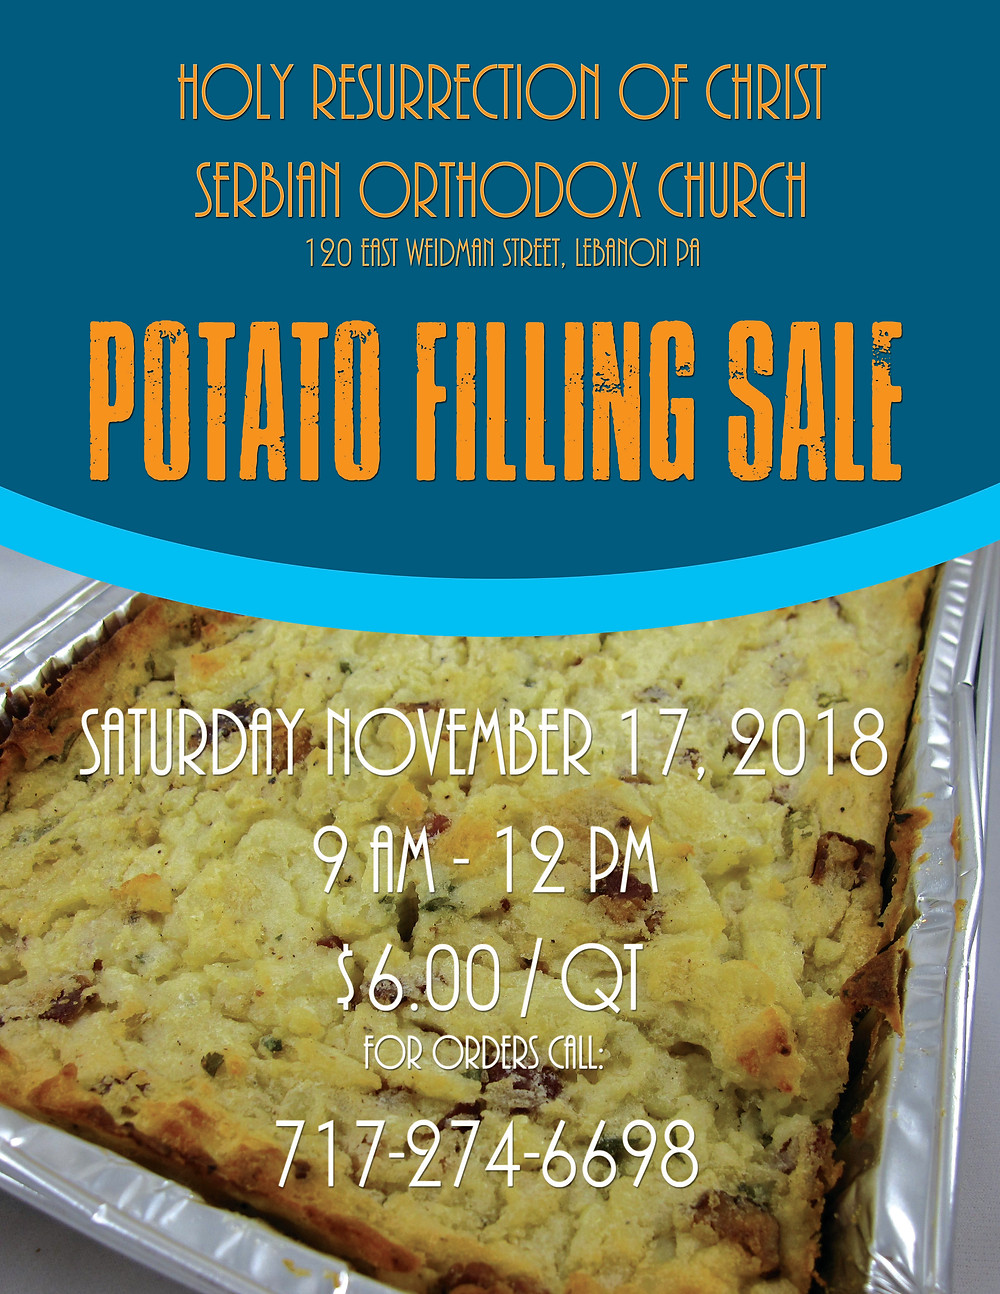 Potato filling sale